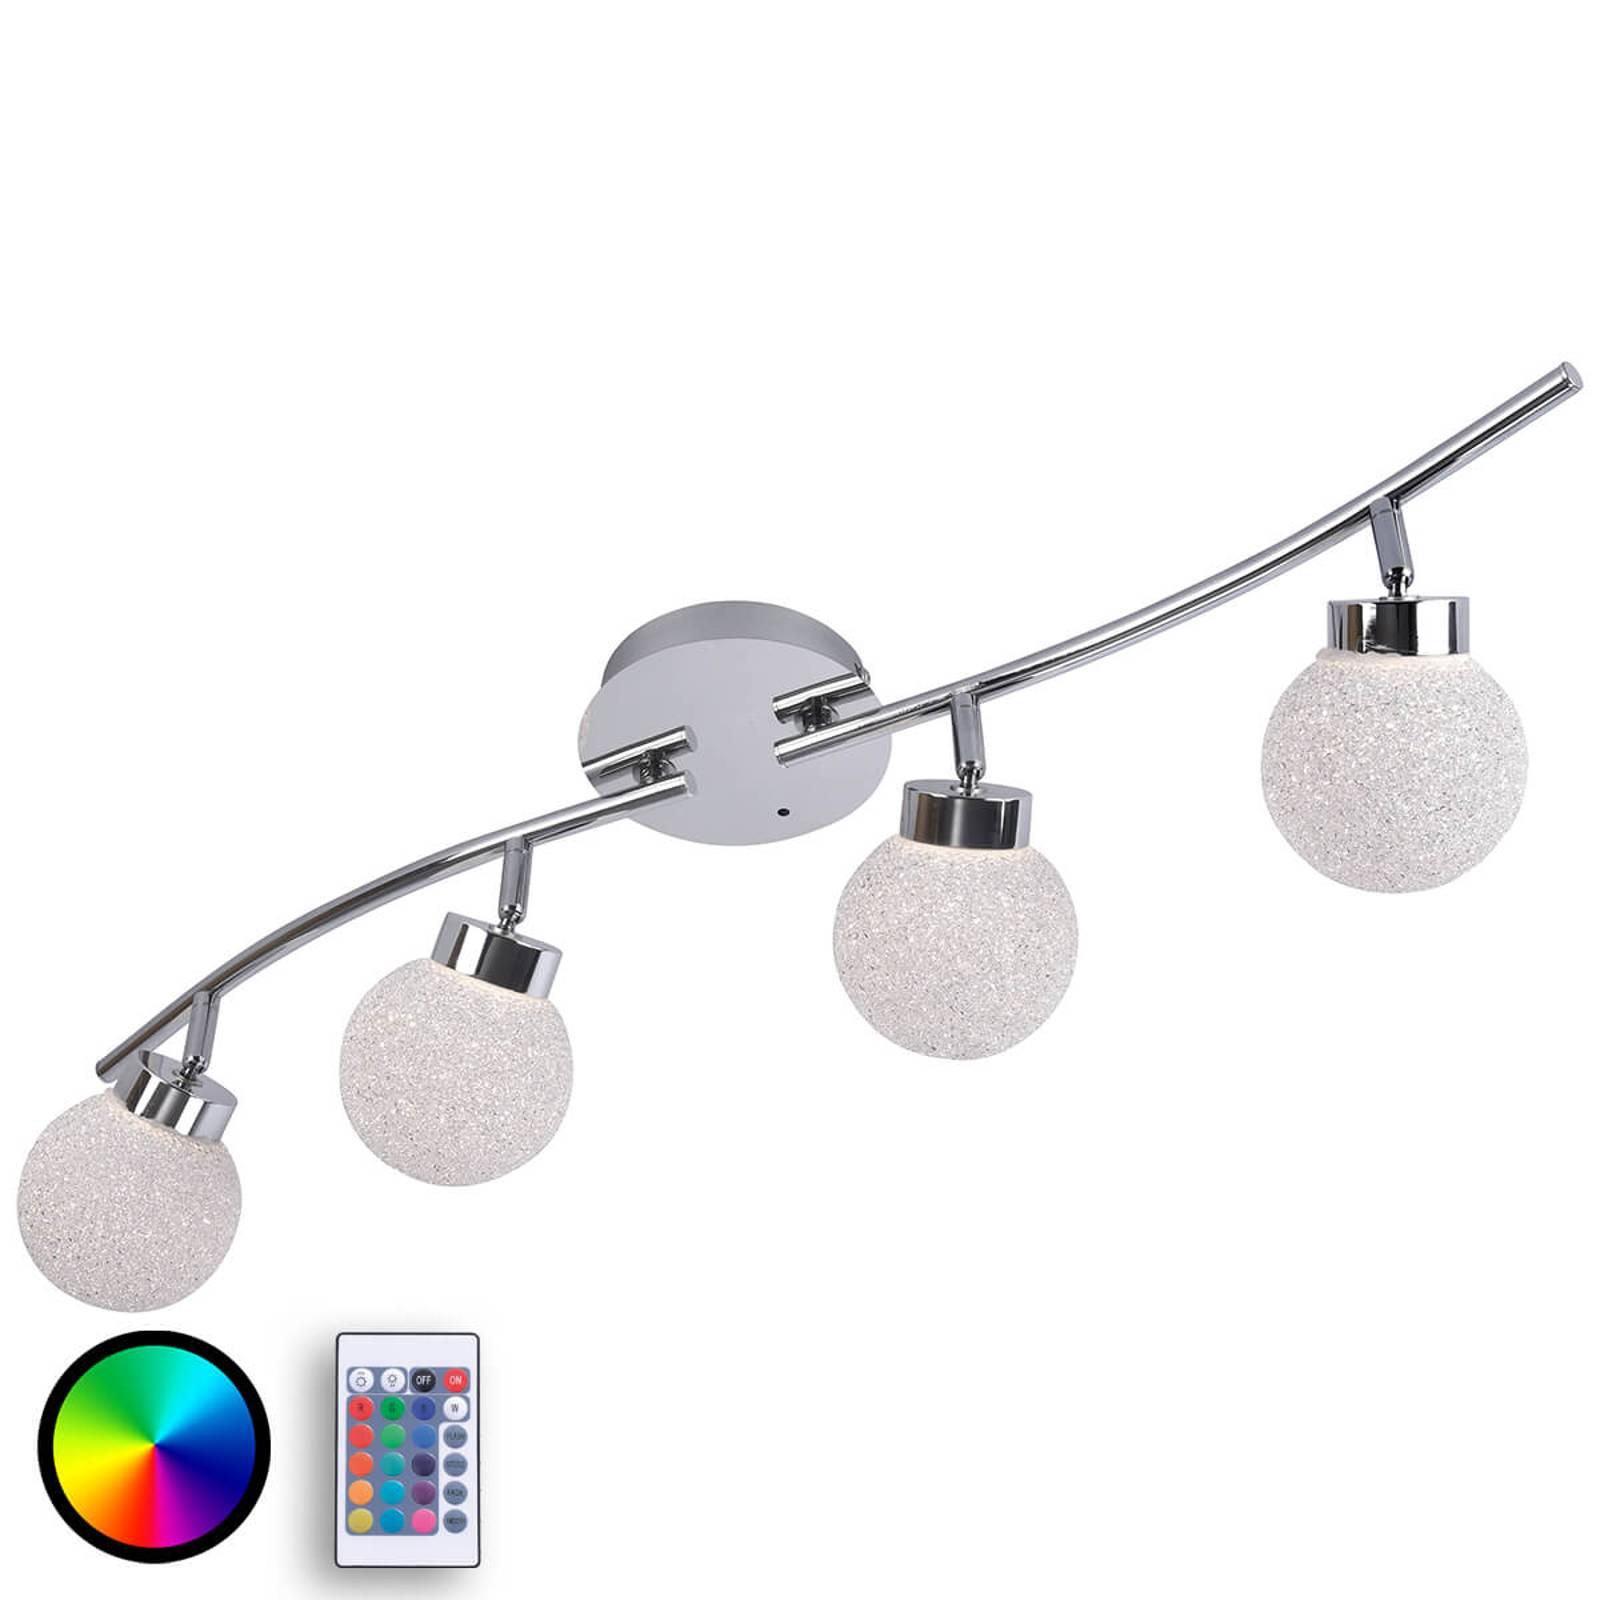 Glanzende RGBW LED plafondlamp Miko met AB